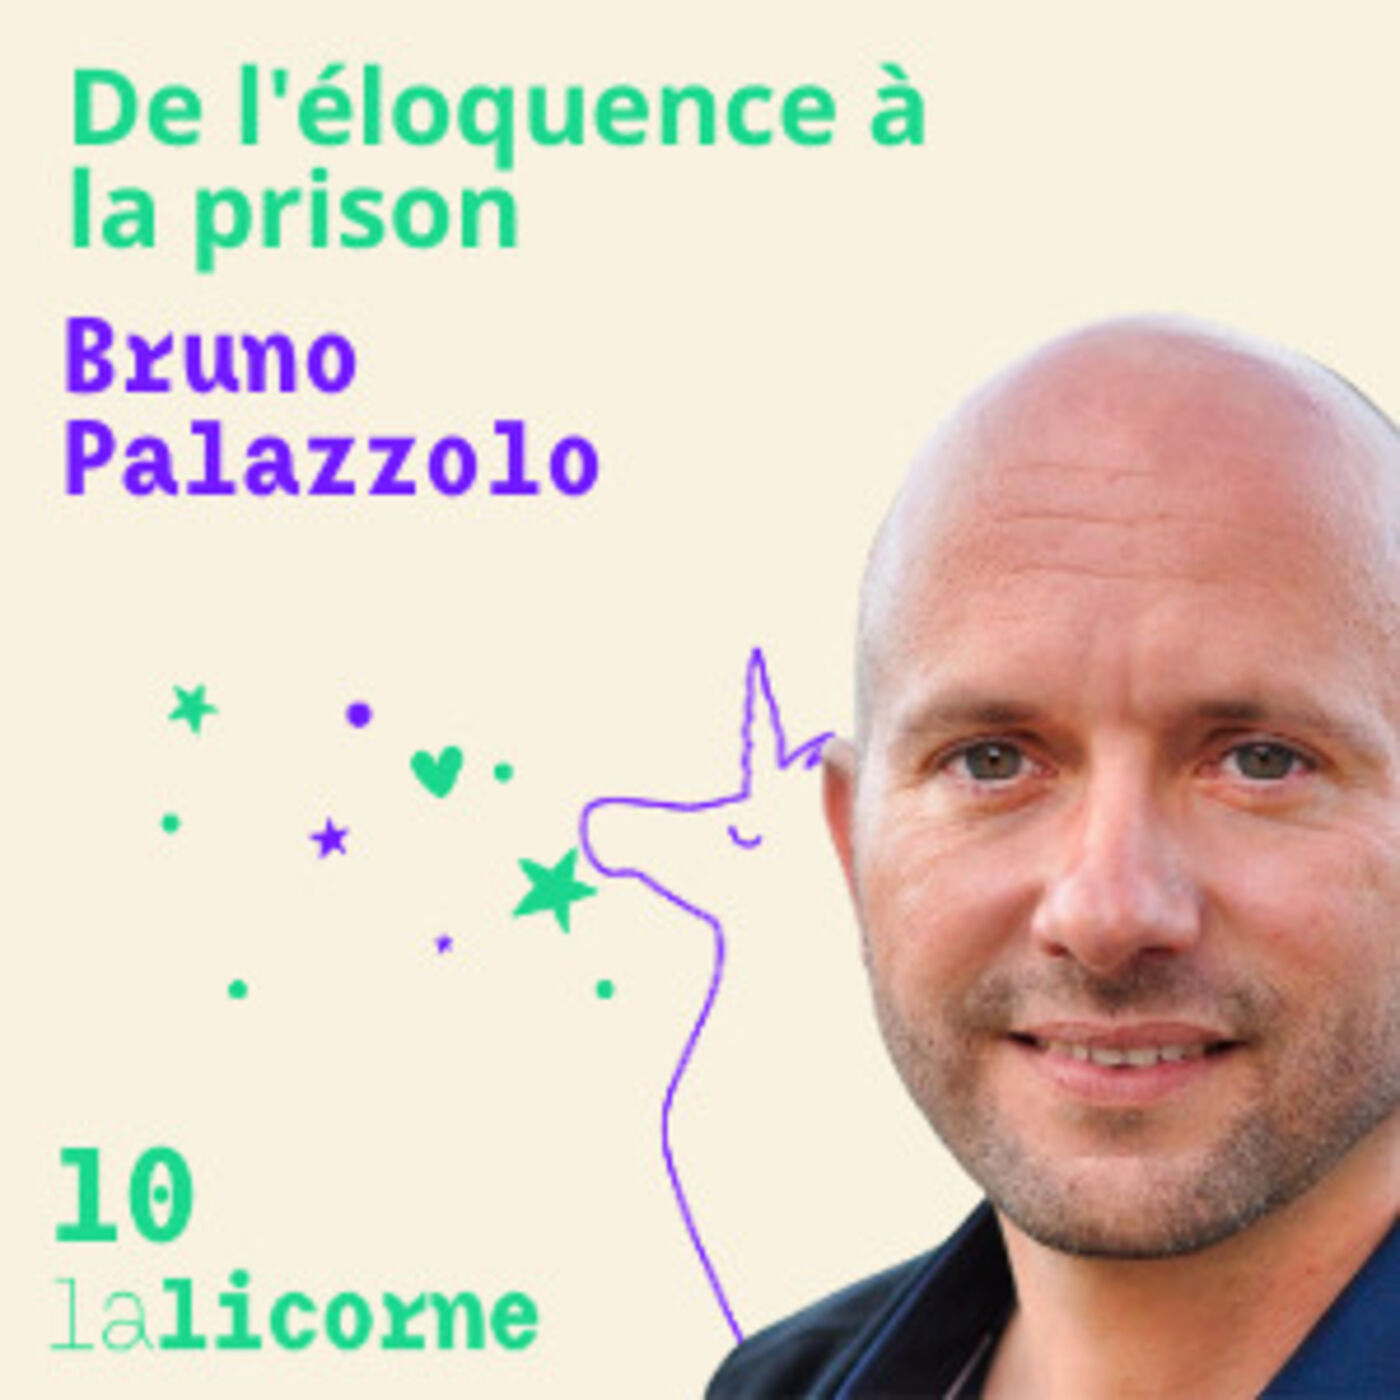 1.11 🗣 Bruno Palazzolo - De l'éloquence à  la prison